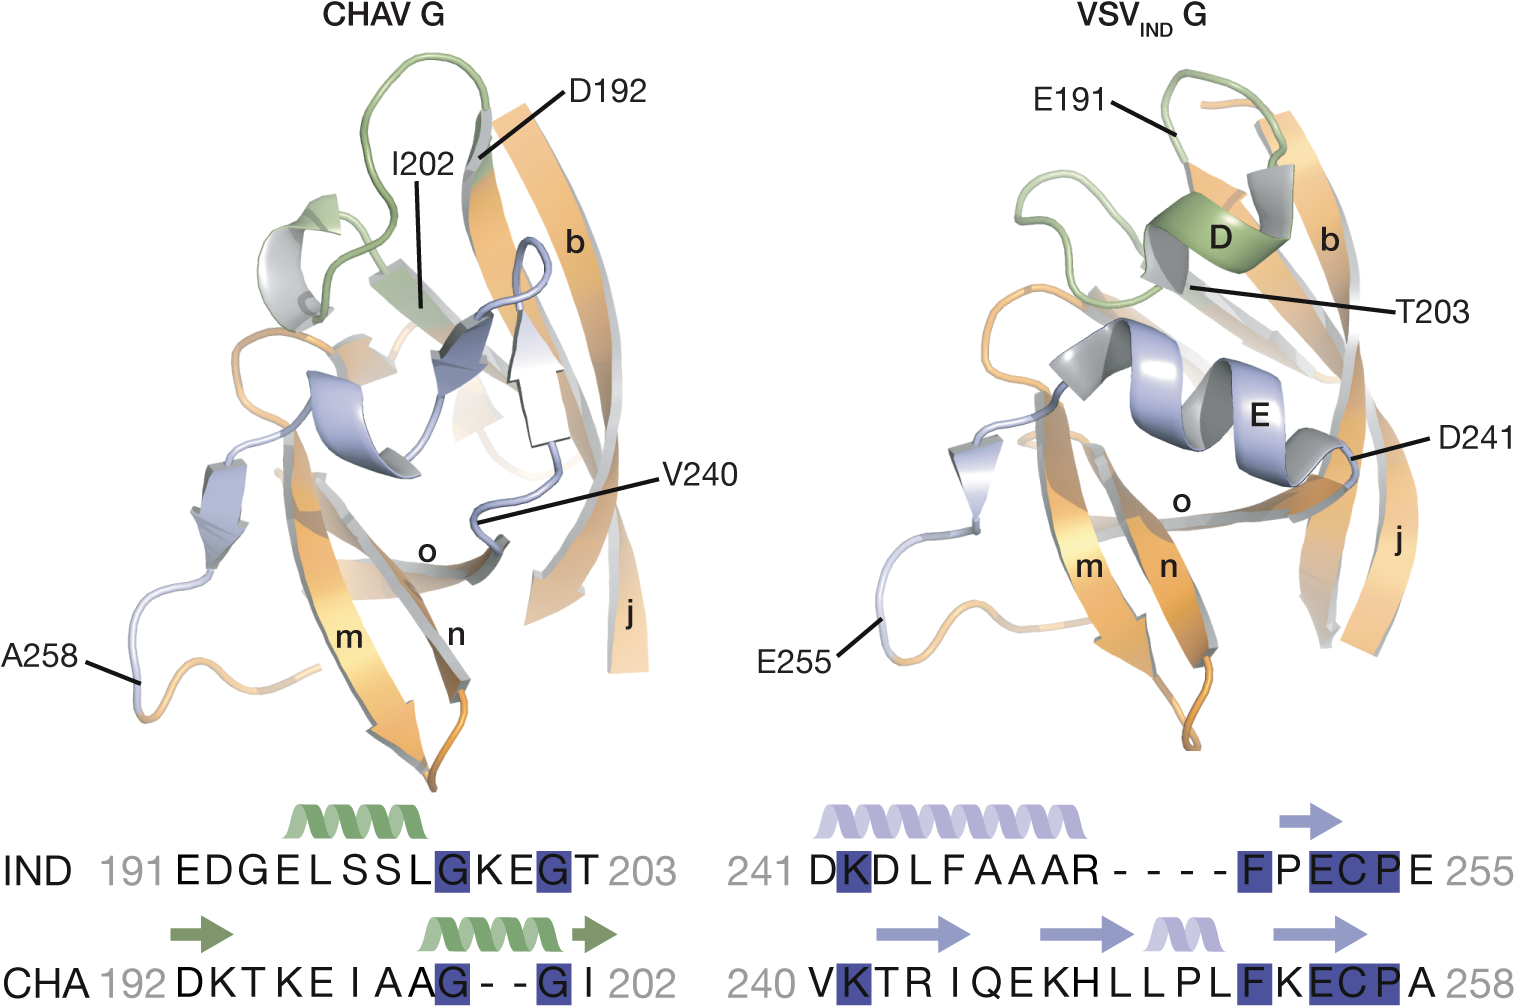 Ribbon representation of CHAV-G and VSV-G PHDs.